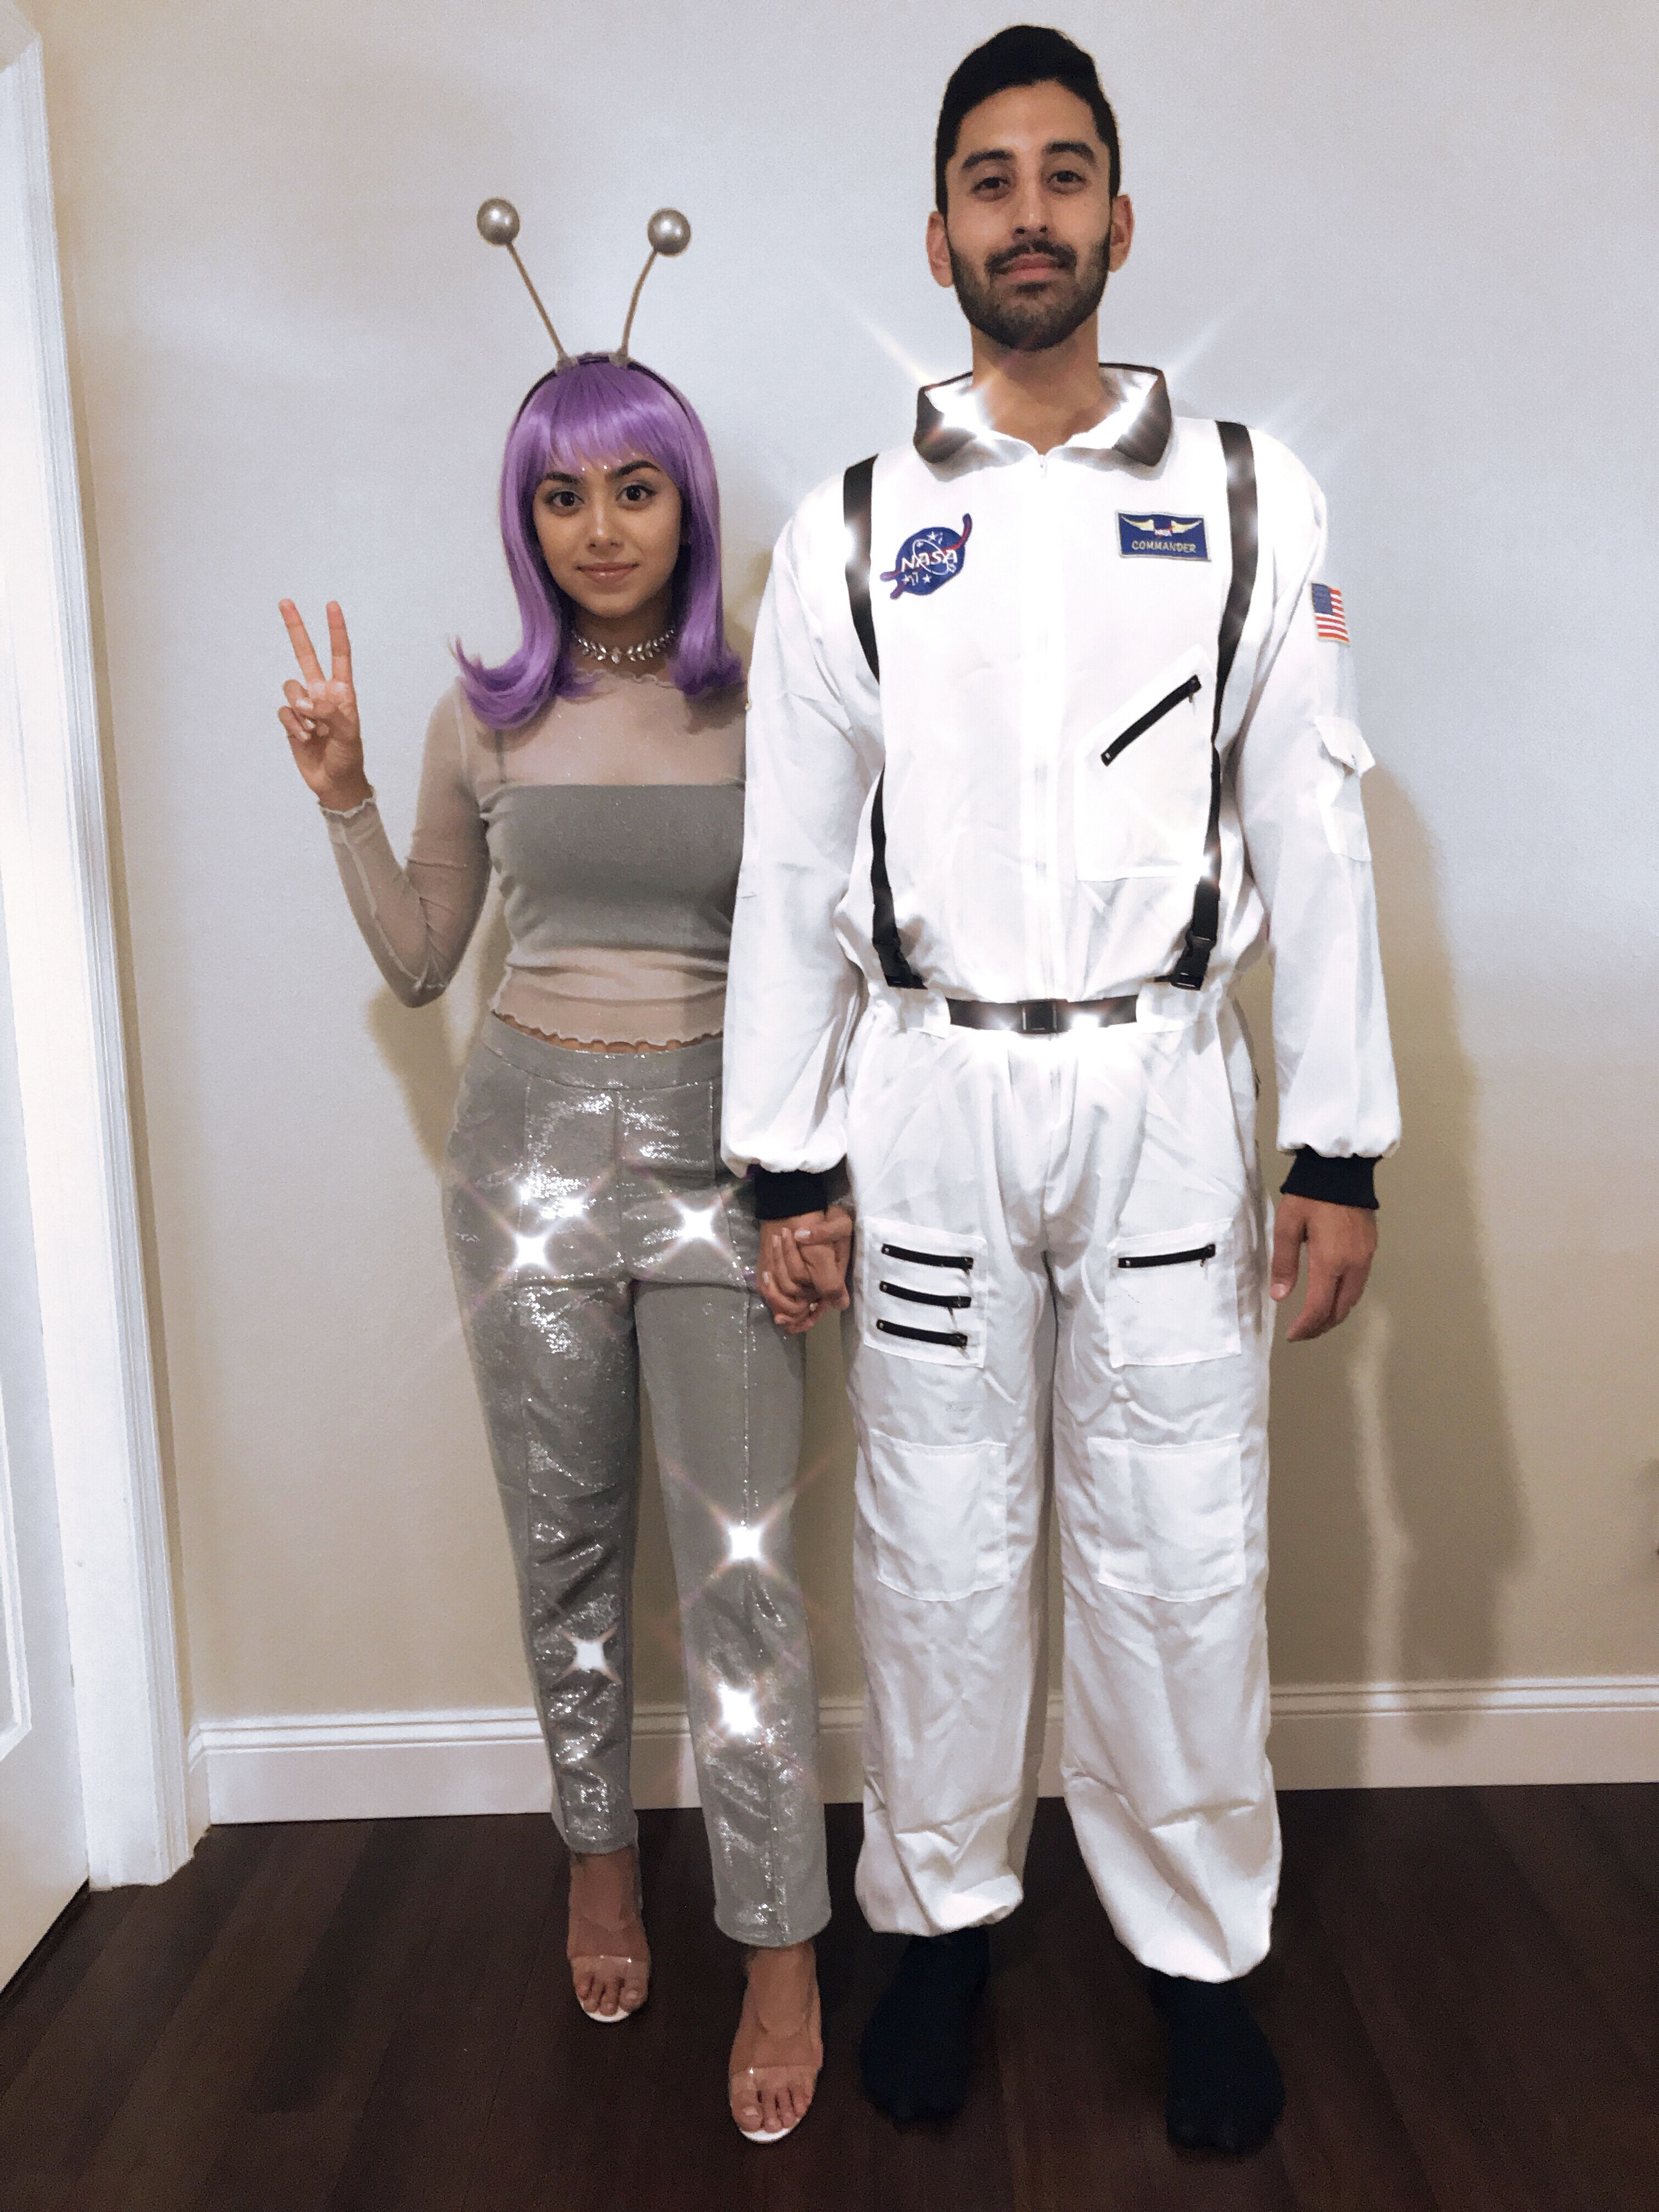 ee17e1231b16 Alien and Astronaut couple costume Halloween nasa